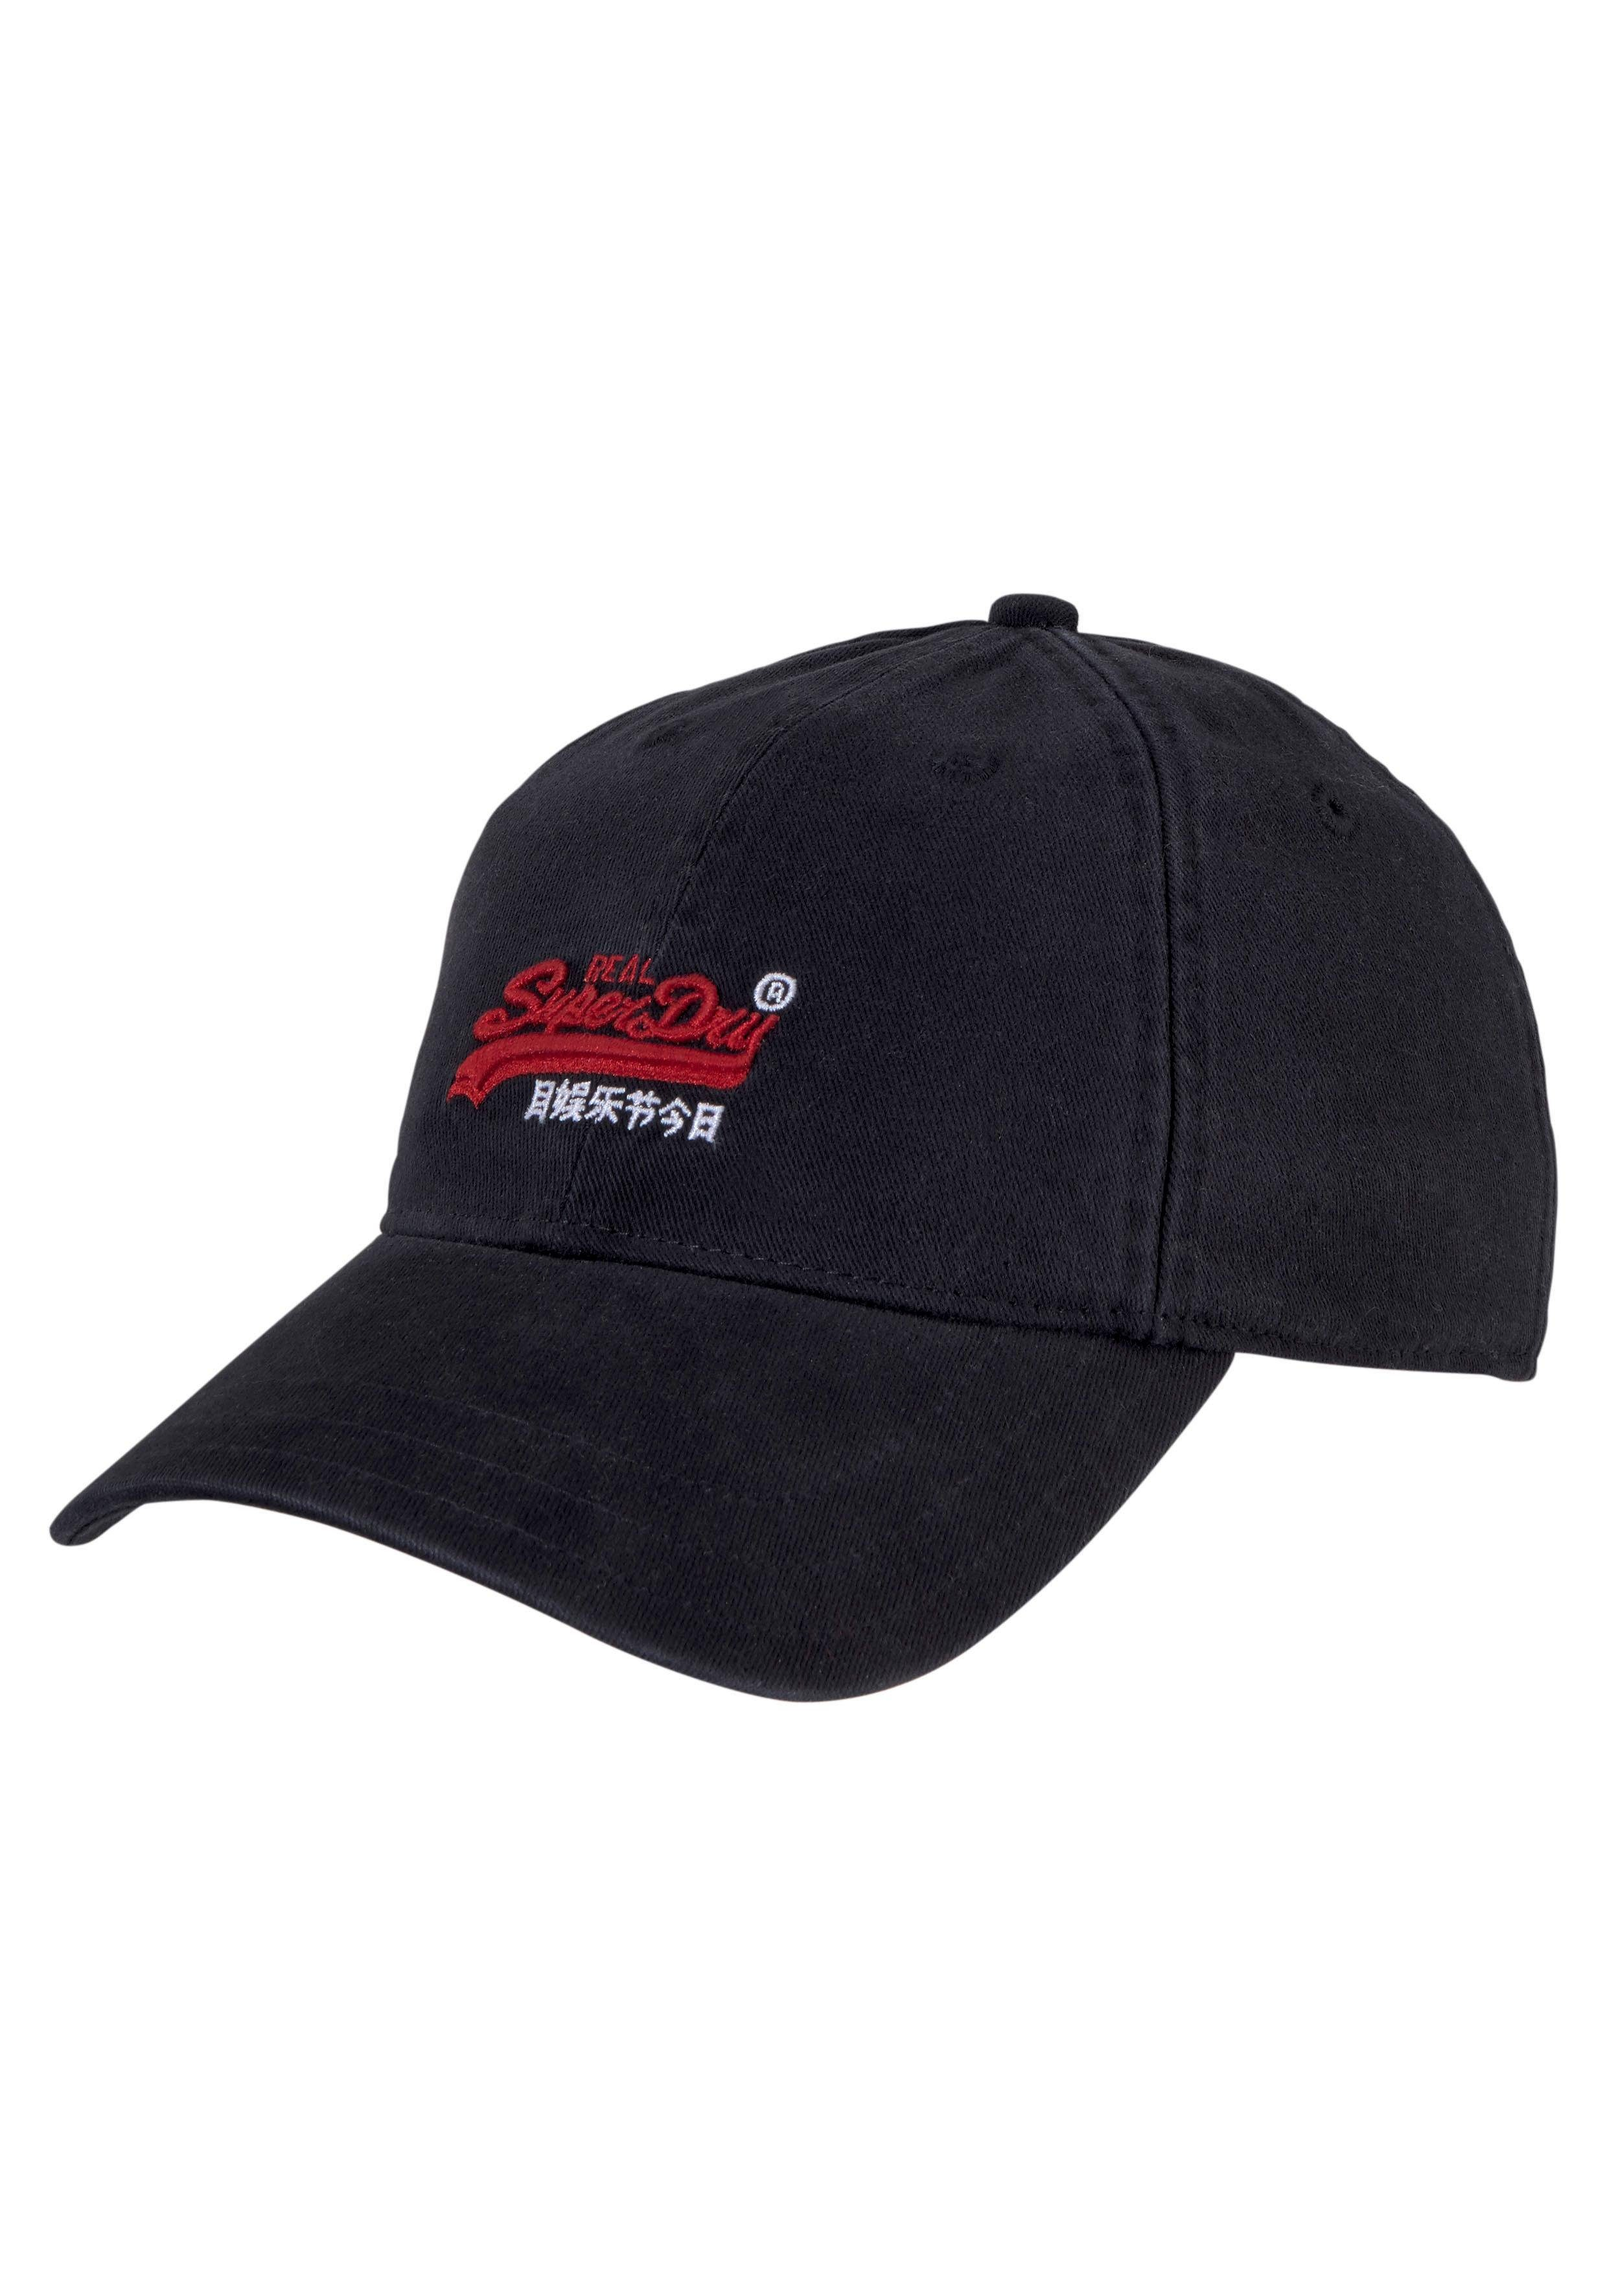 Superdry Baseball Cap Orange Label Twill Cap, Logo Stitching